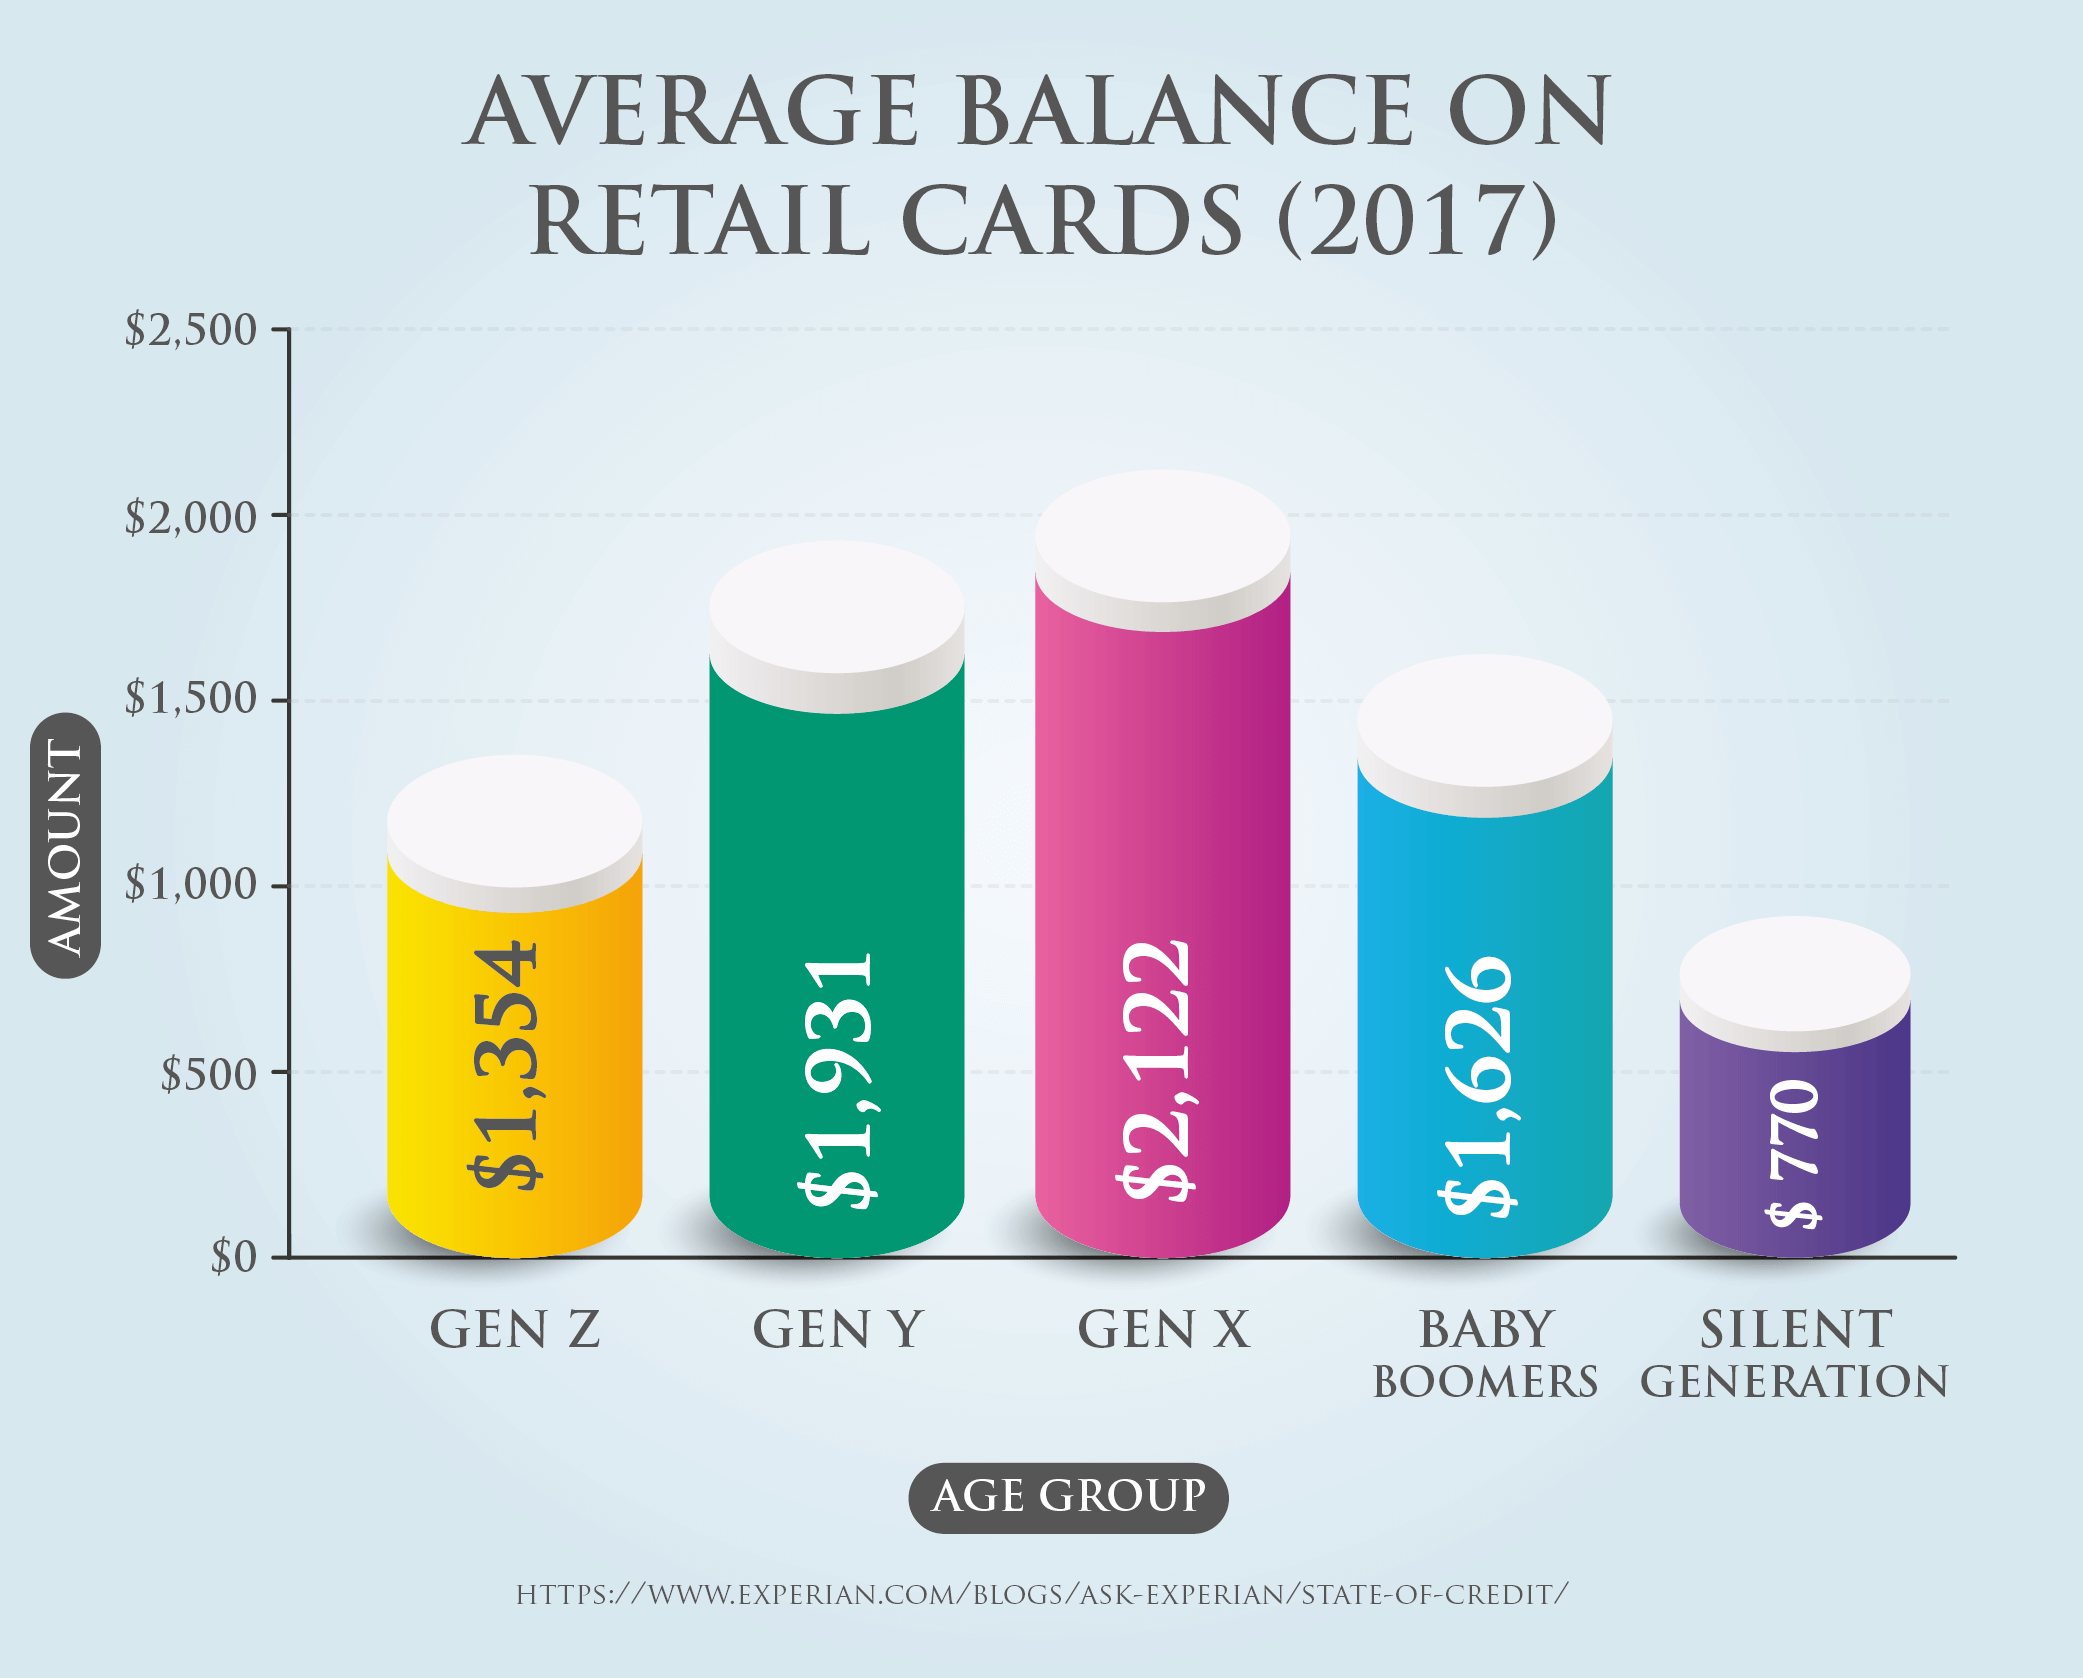 Average Balance on Retail Cards (2017)